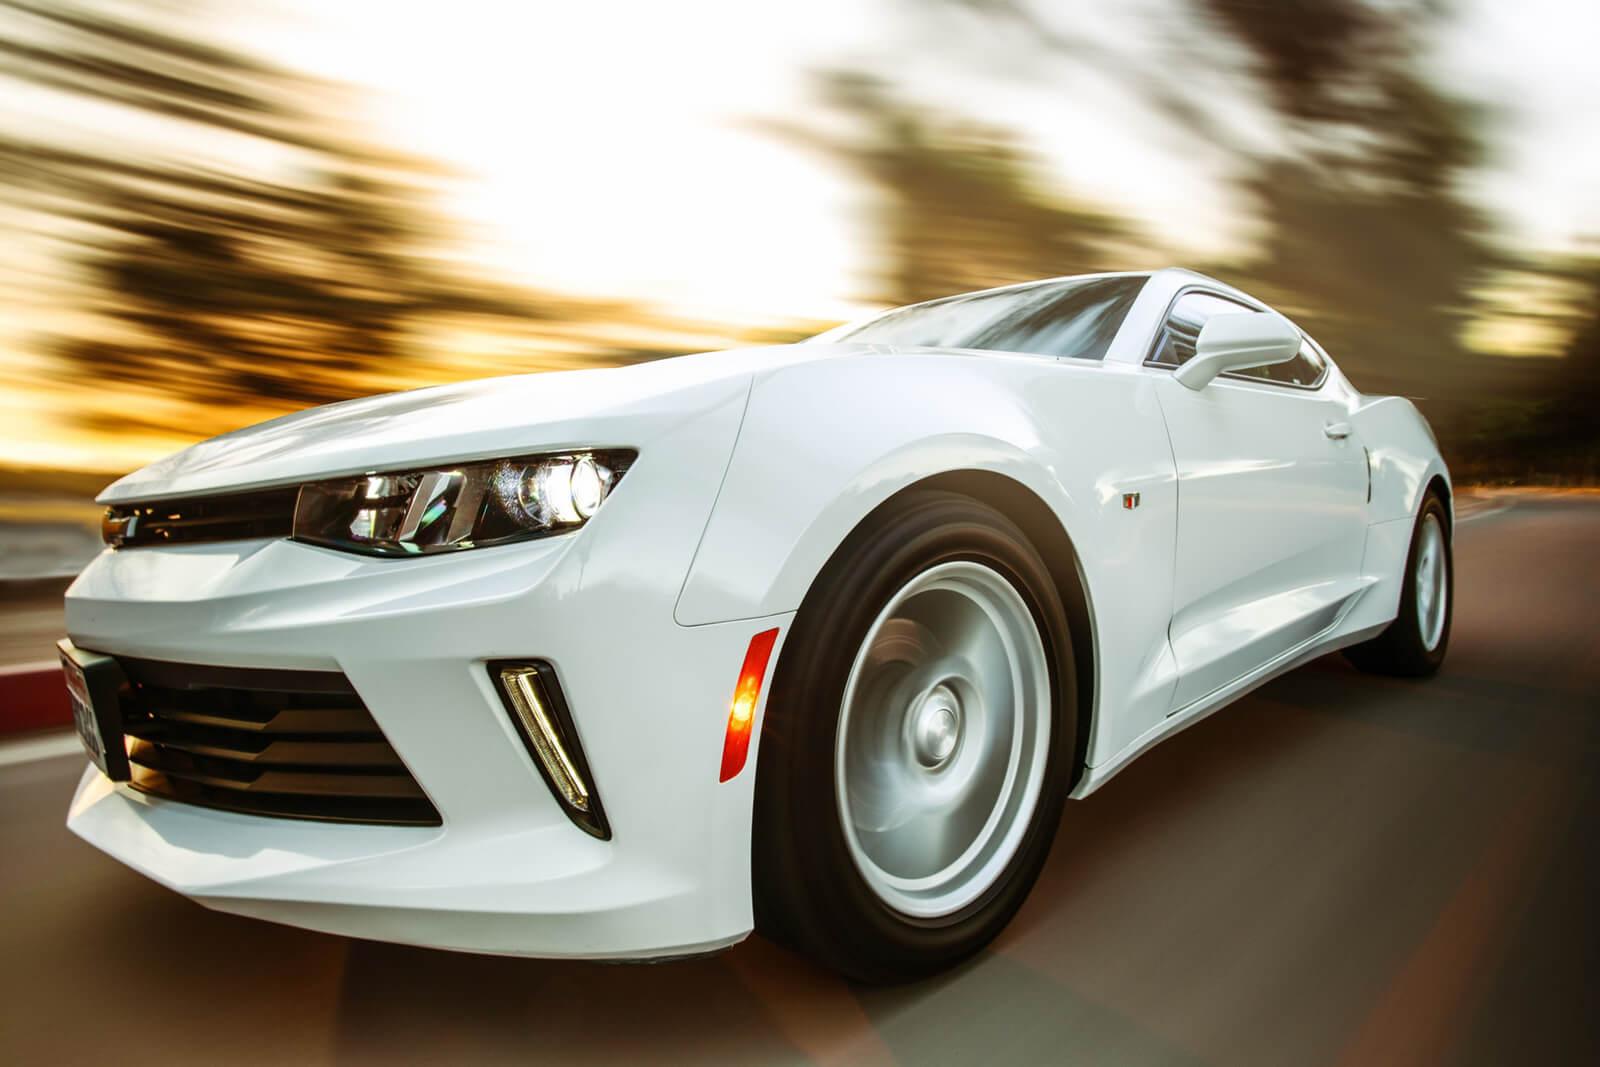 Can An Auto Insurance Company Sue Me?